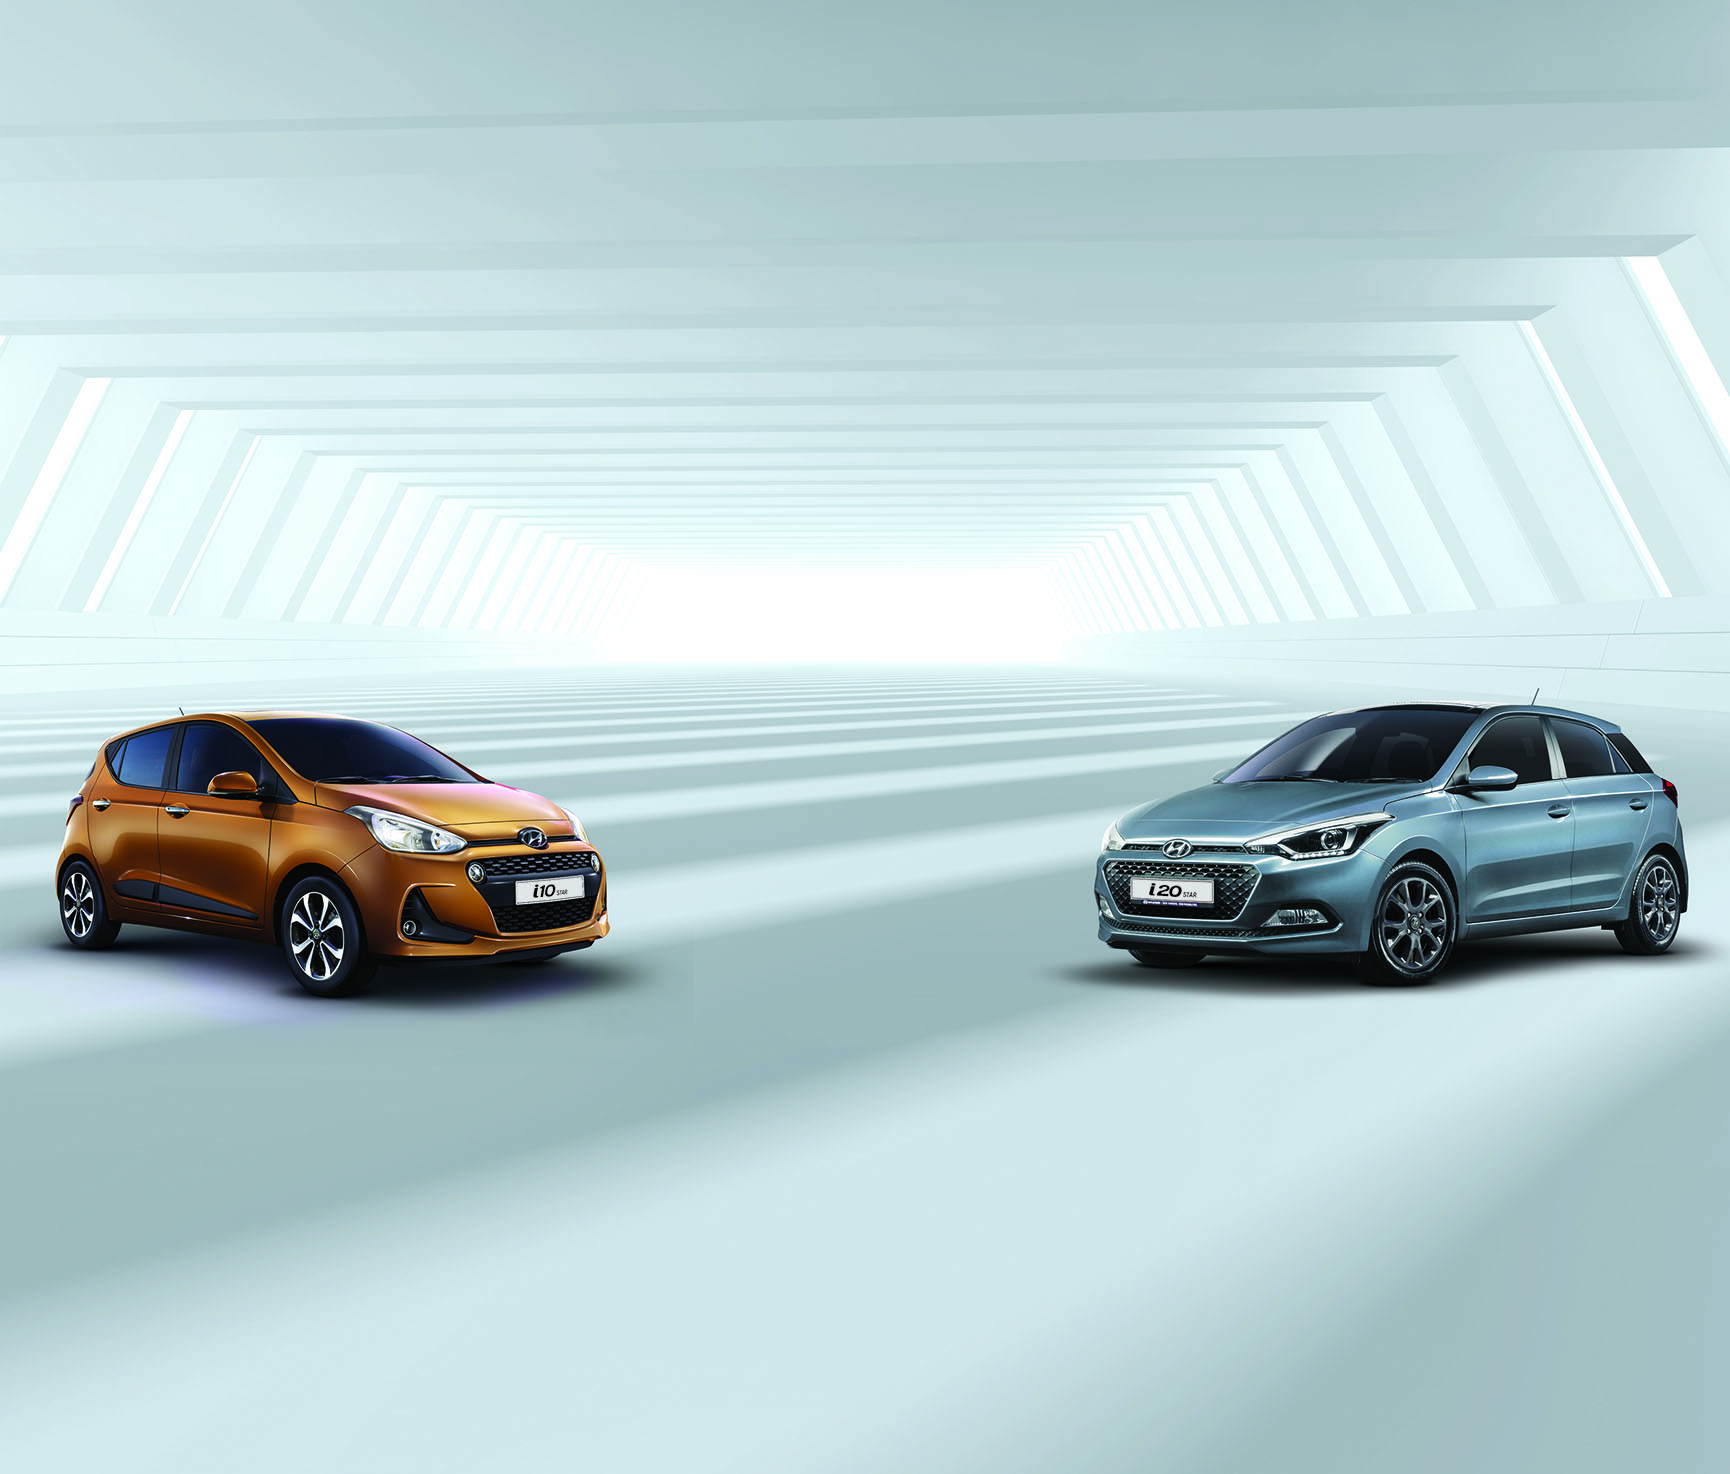 Hyundai'den 20'nci Yıla Özel Seri: i10 Star ve i20 Star